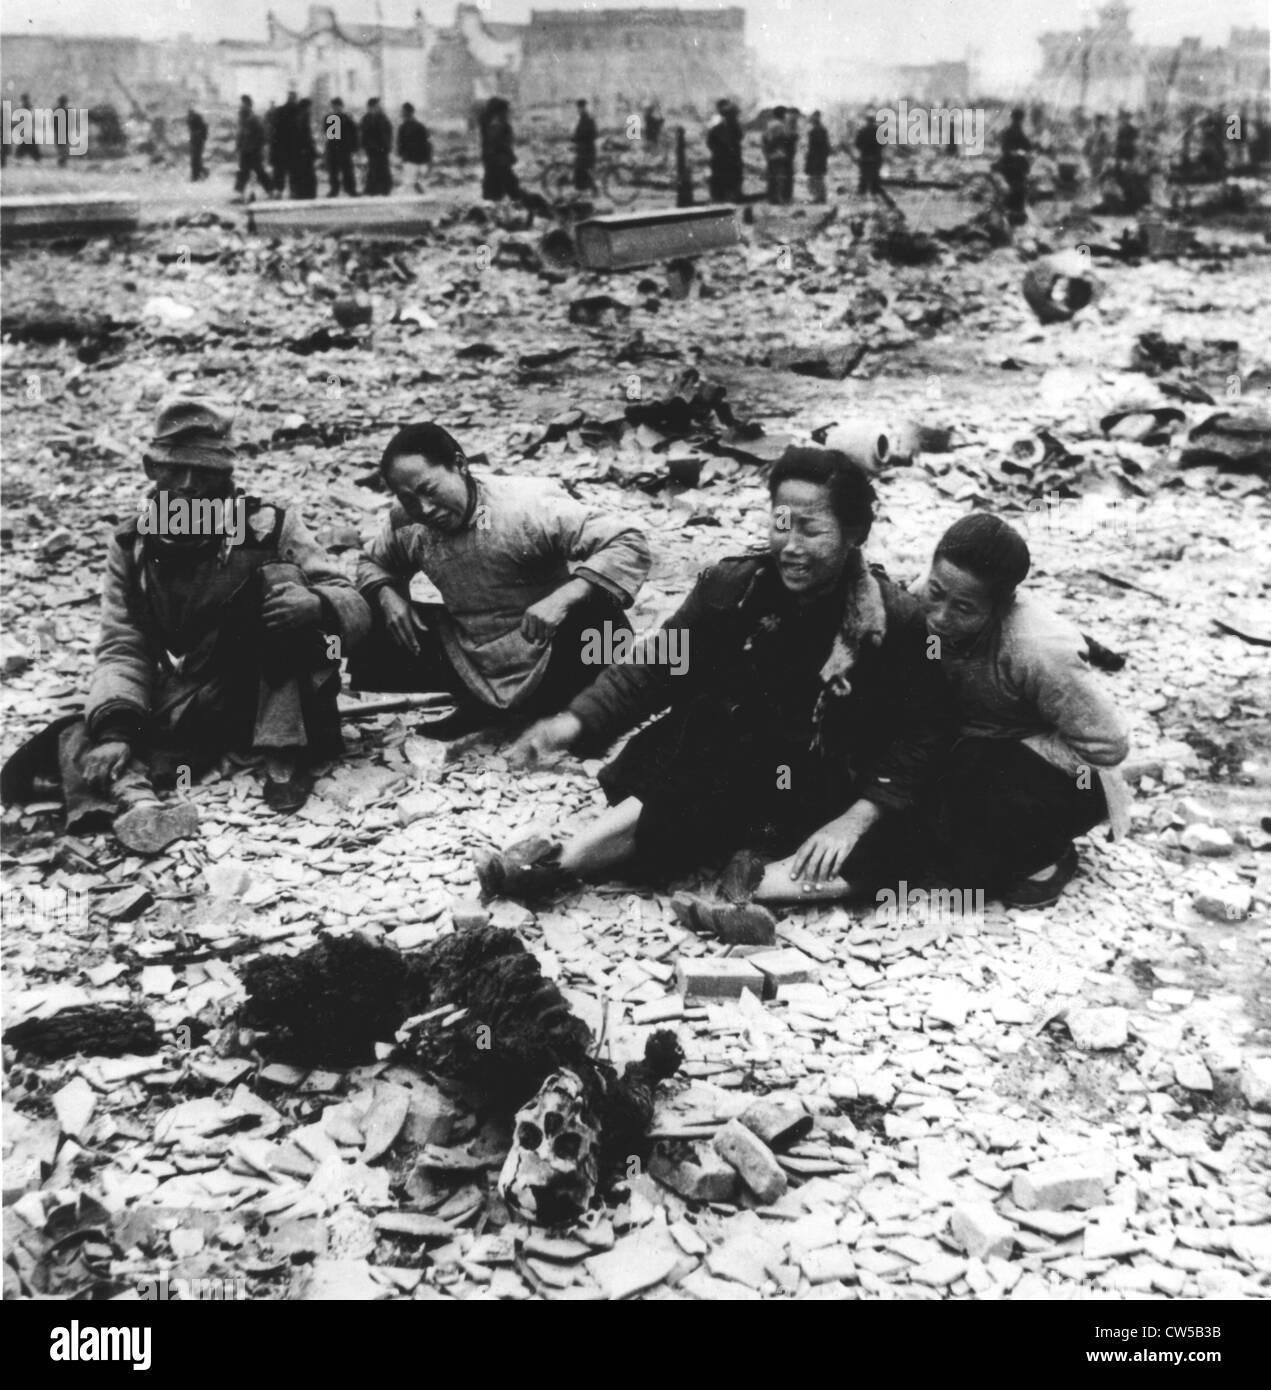 China, Sino-Japanese War, massacre of civilian populations - Stock Image